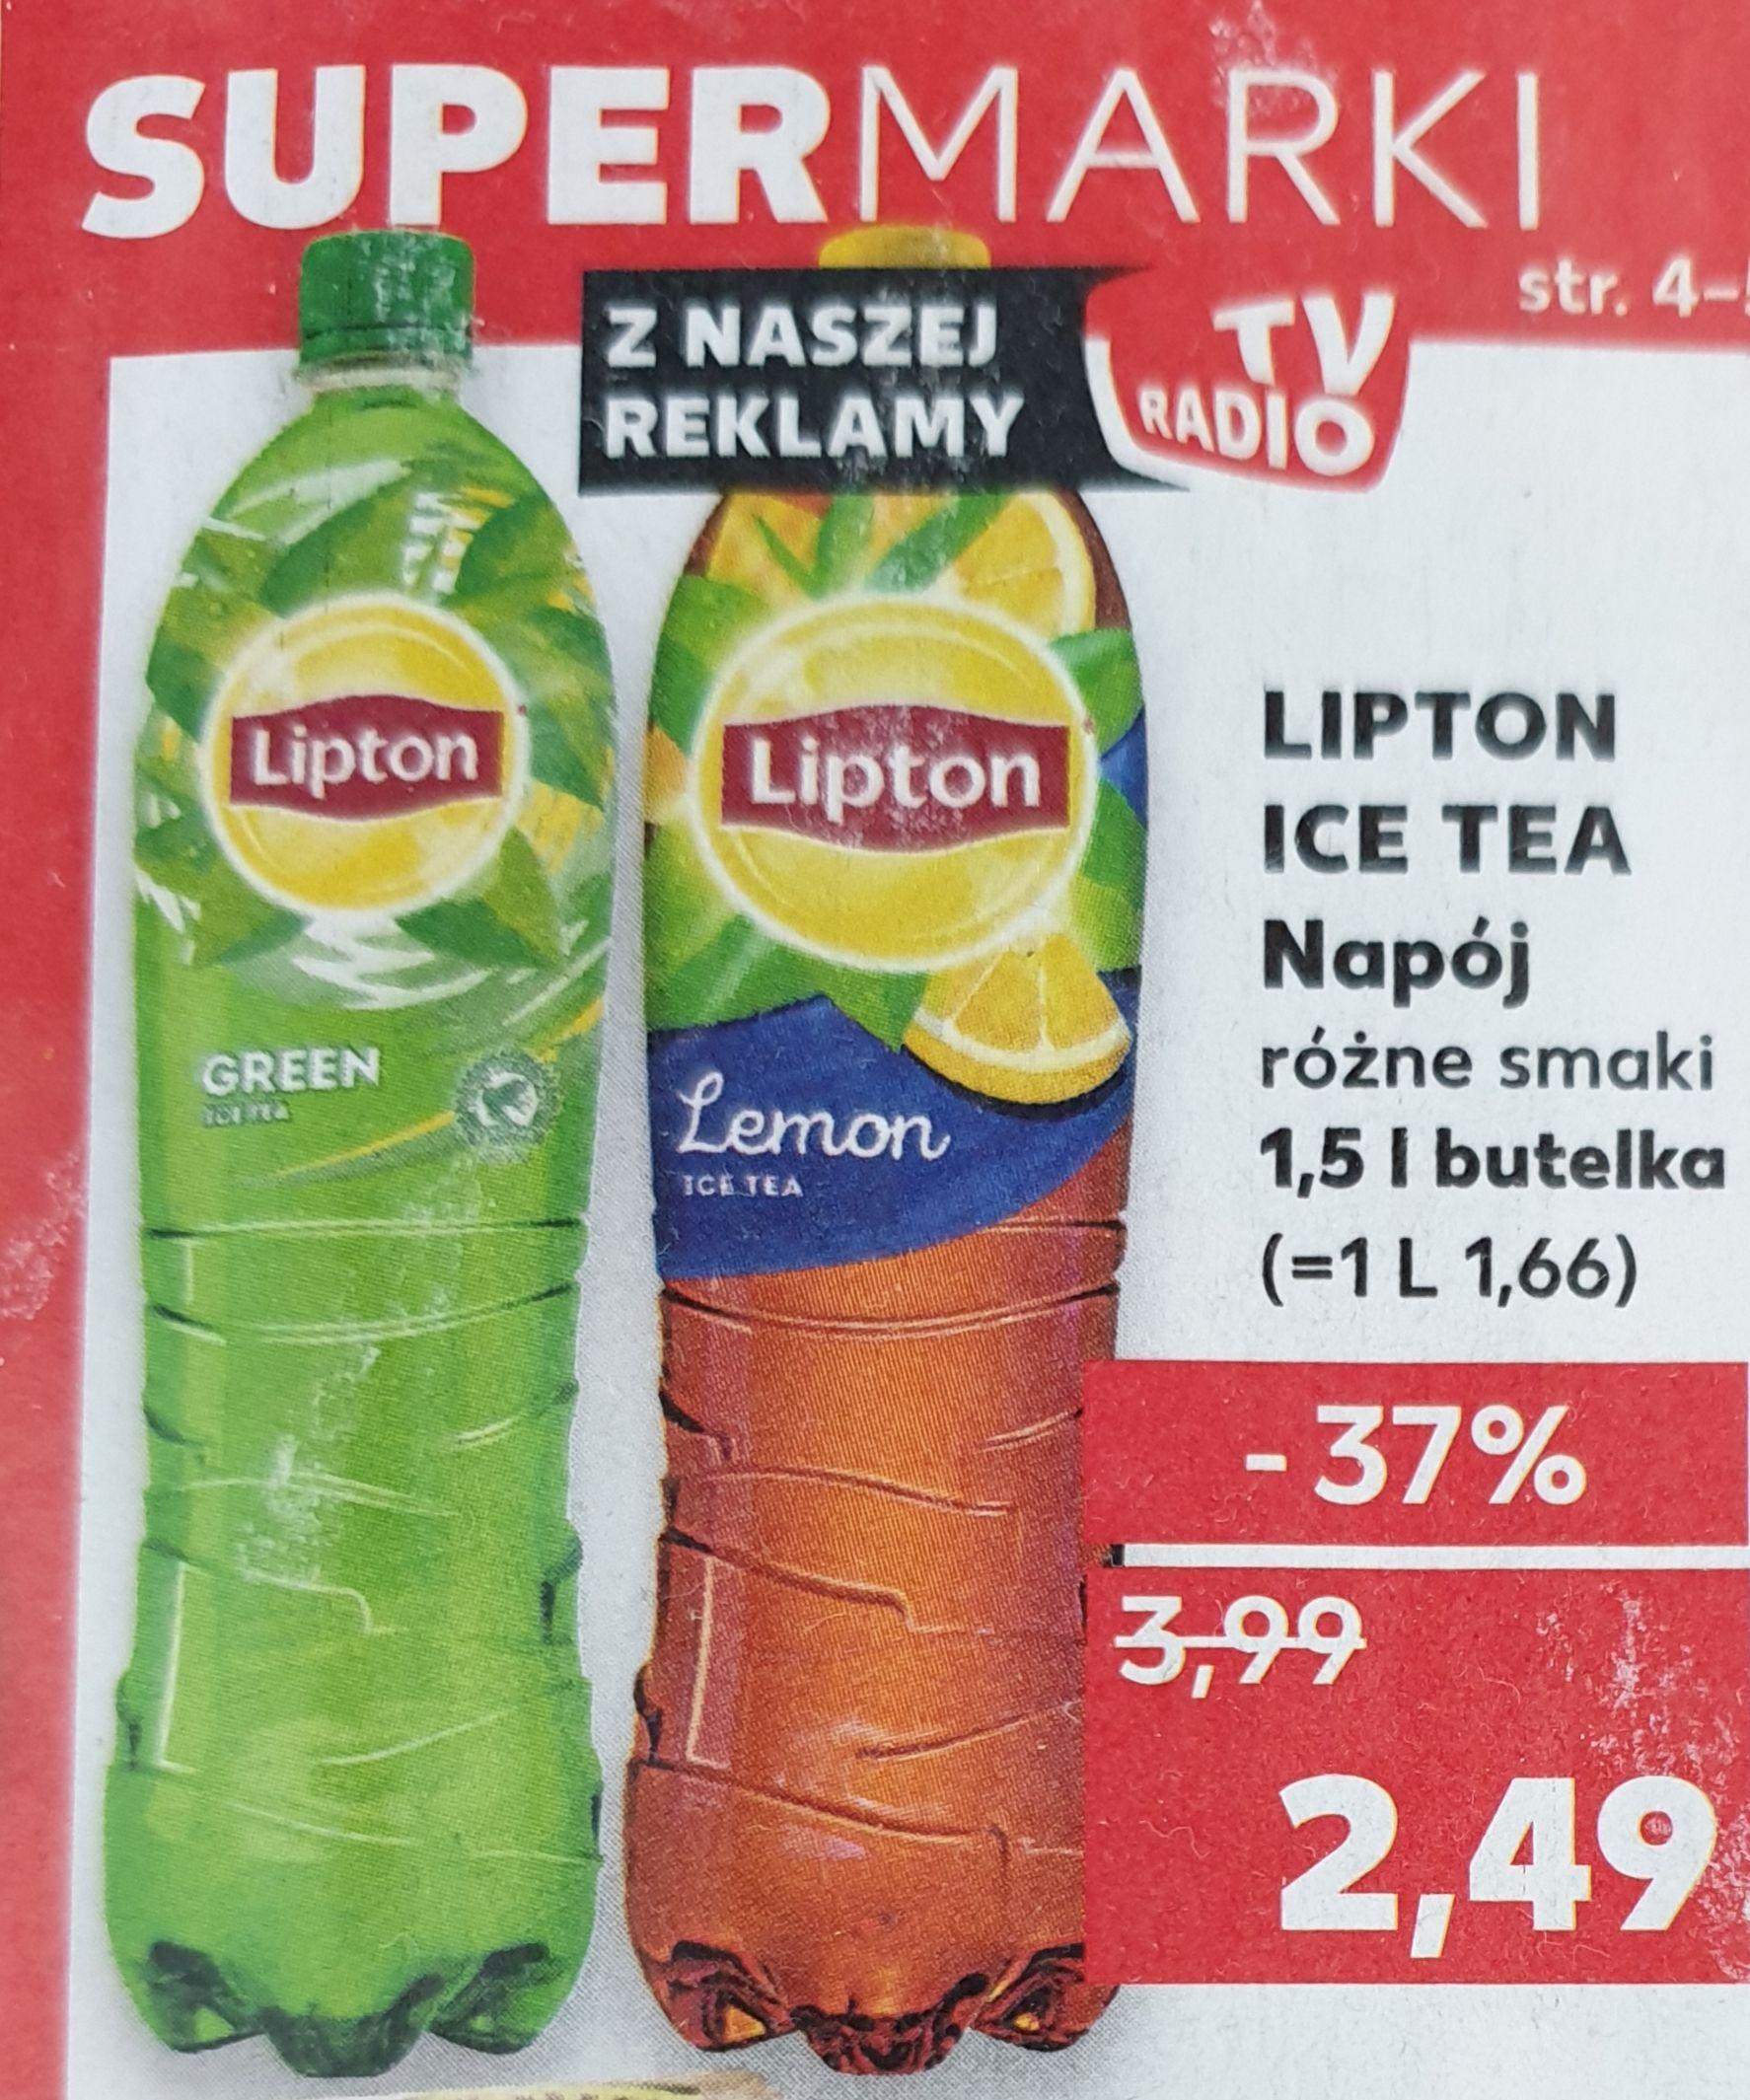 Lipton Ice Tea różne smaki Kaufland oferta do 11.09